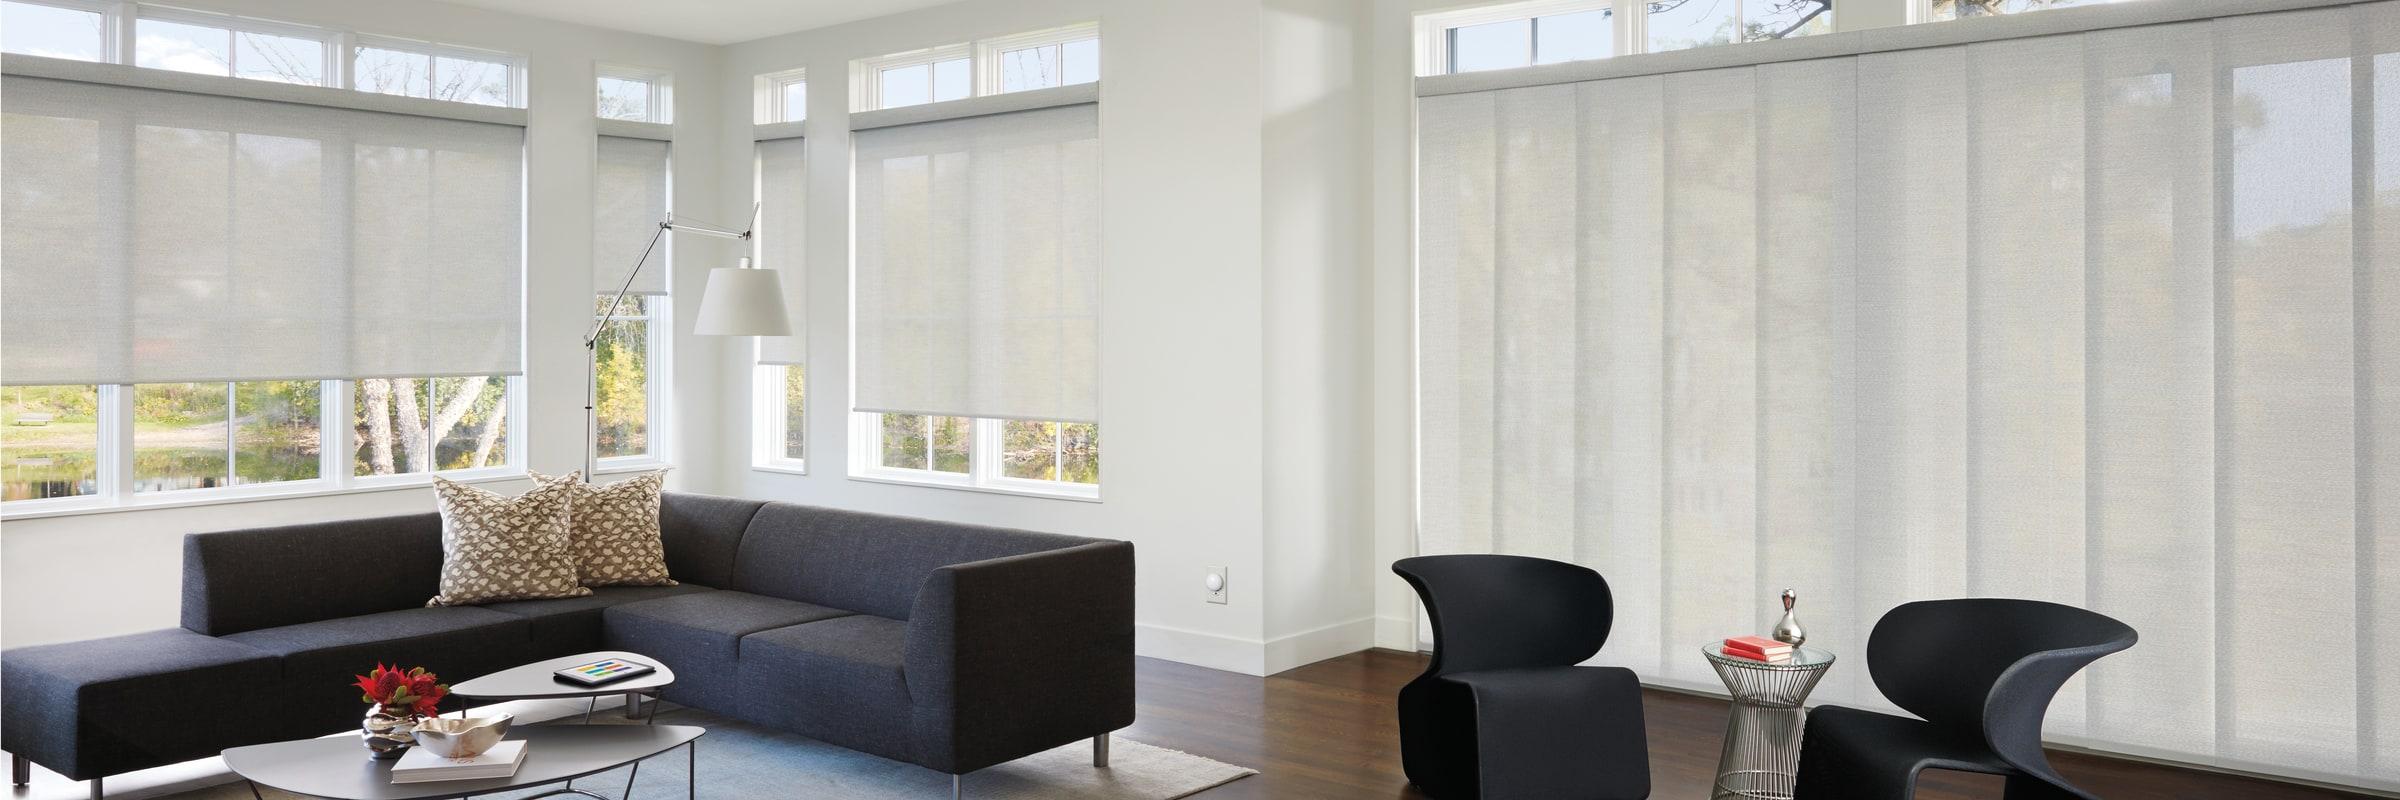 Solar screen shades in Barista White Mocha - Designer Screen Shades